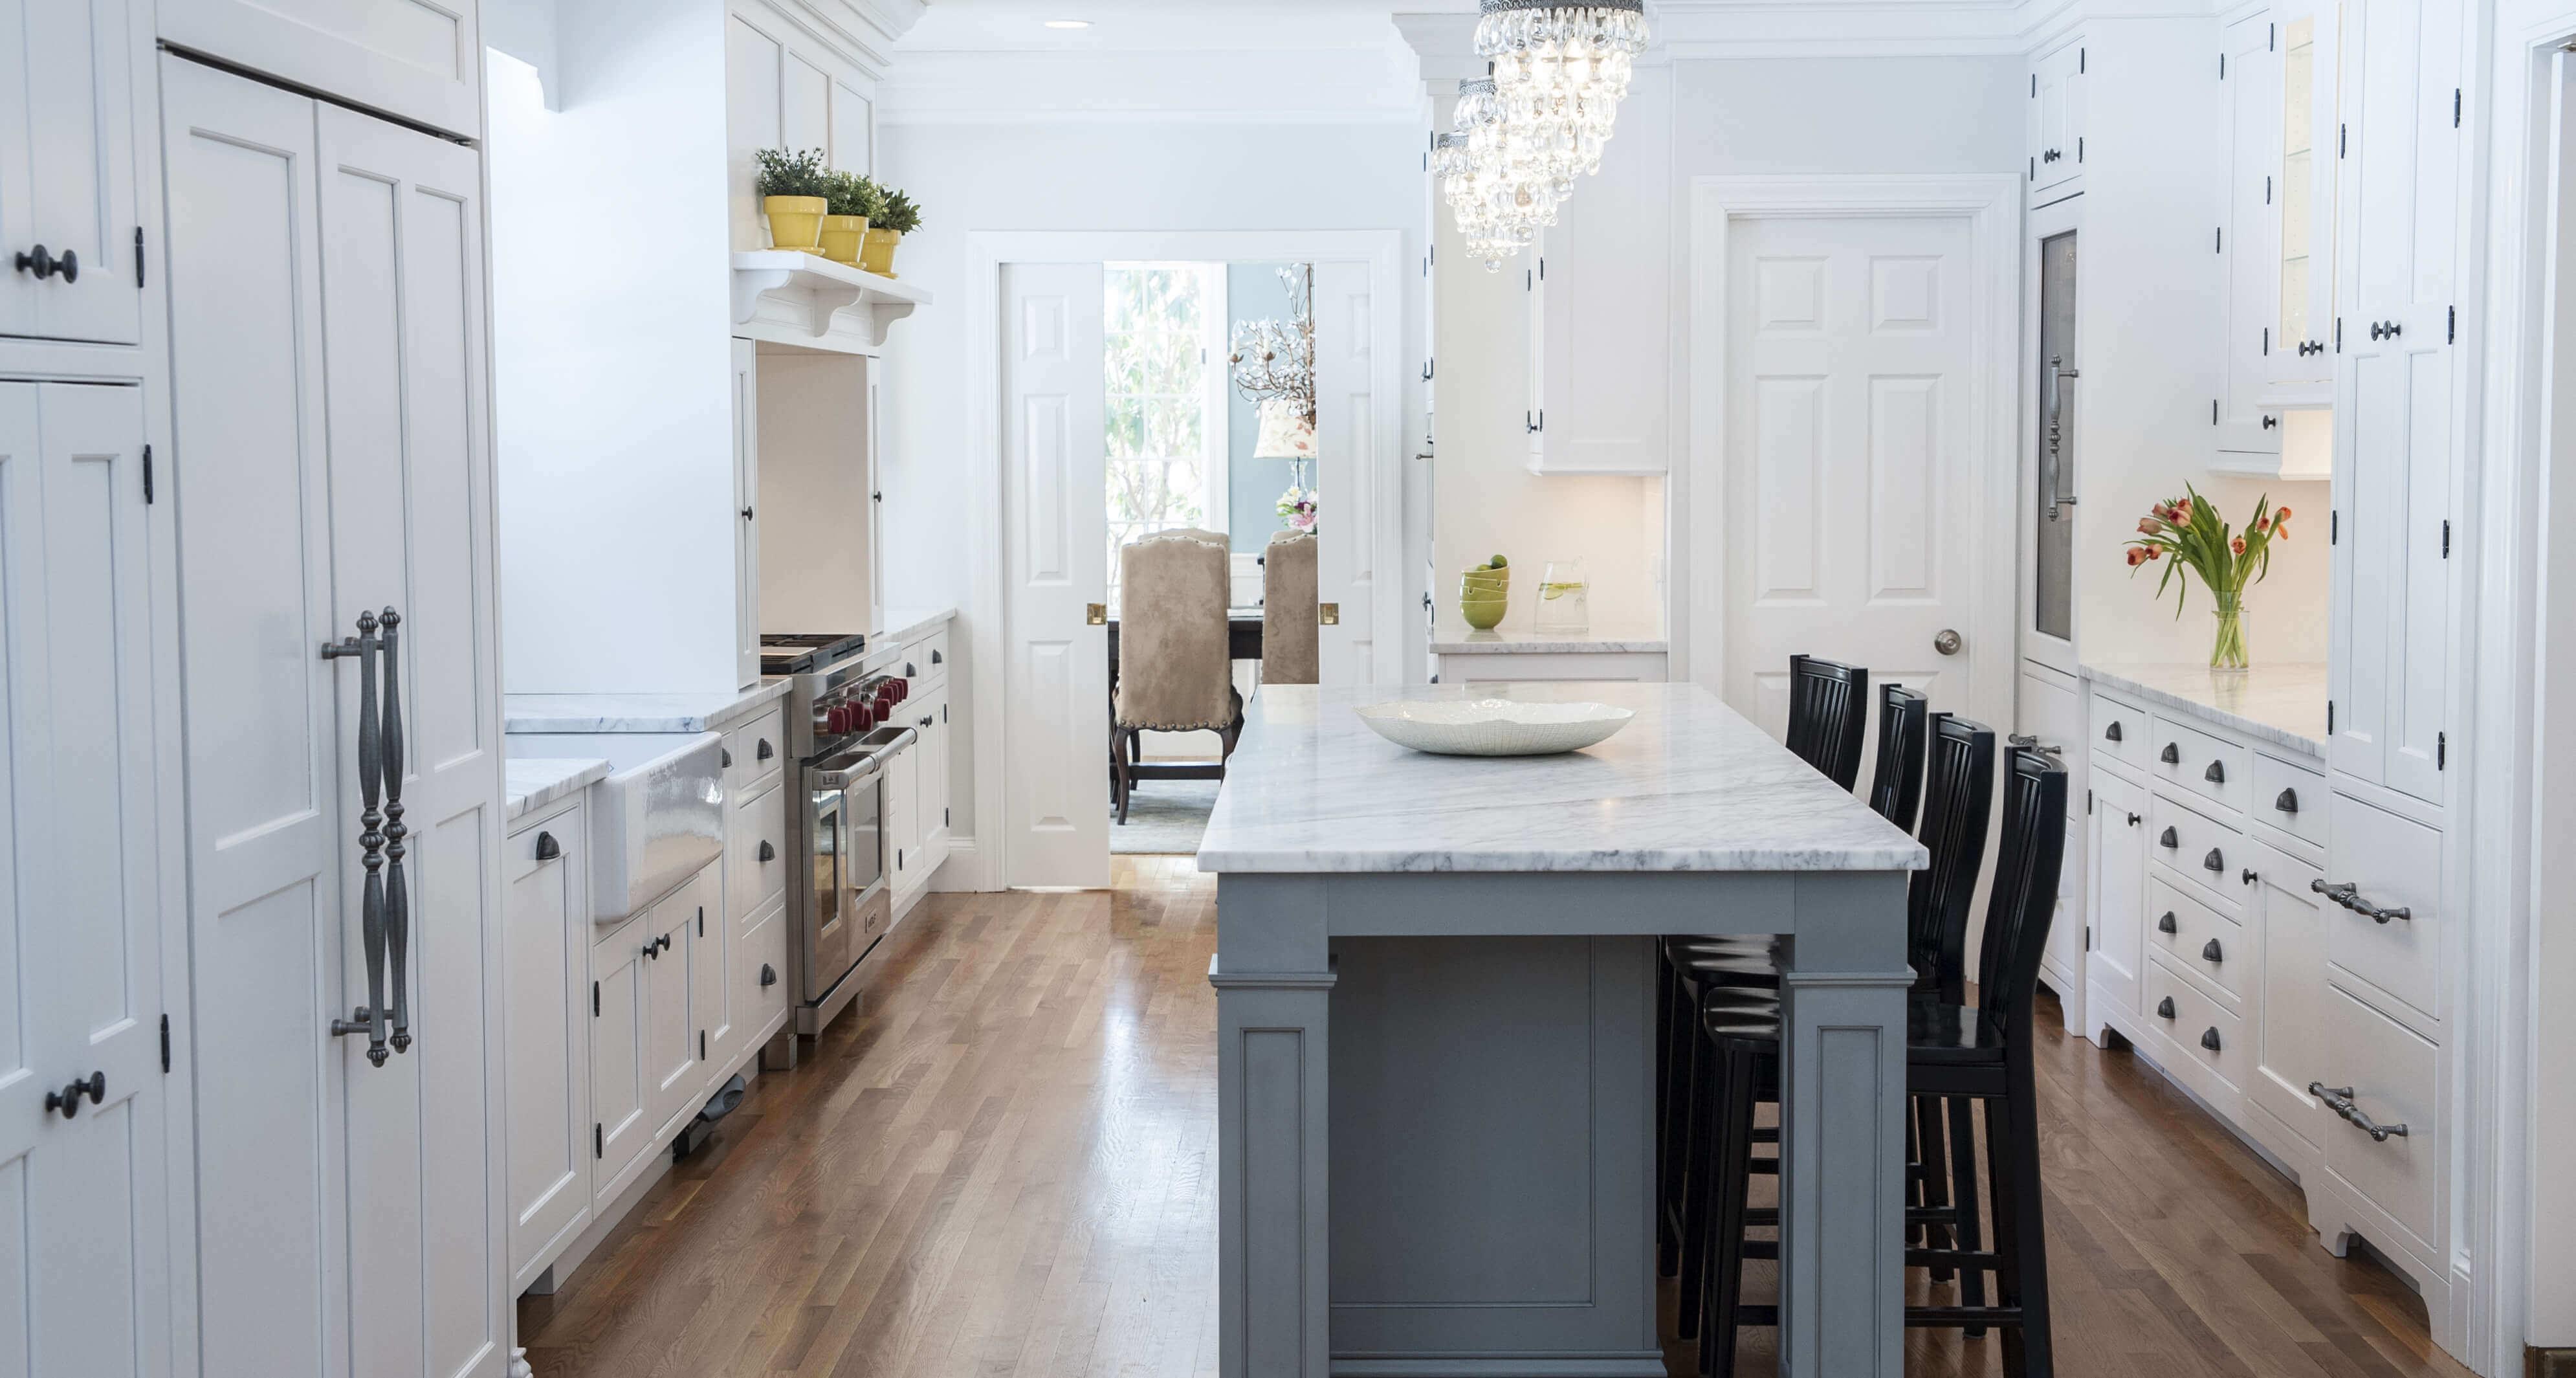 Kitchen Design And Build Center in Westborough Massachusetts